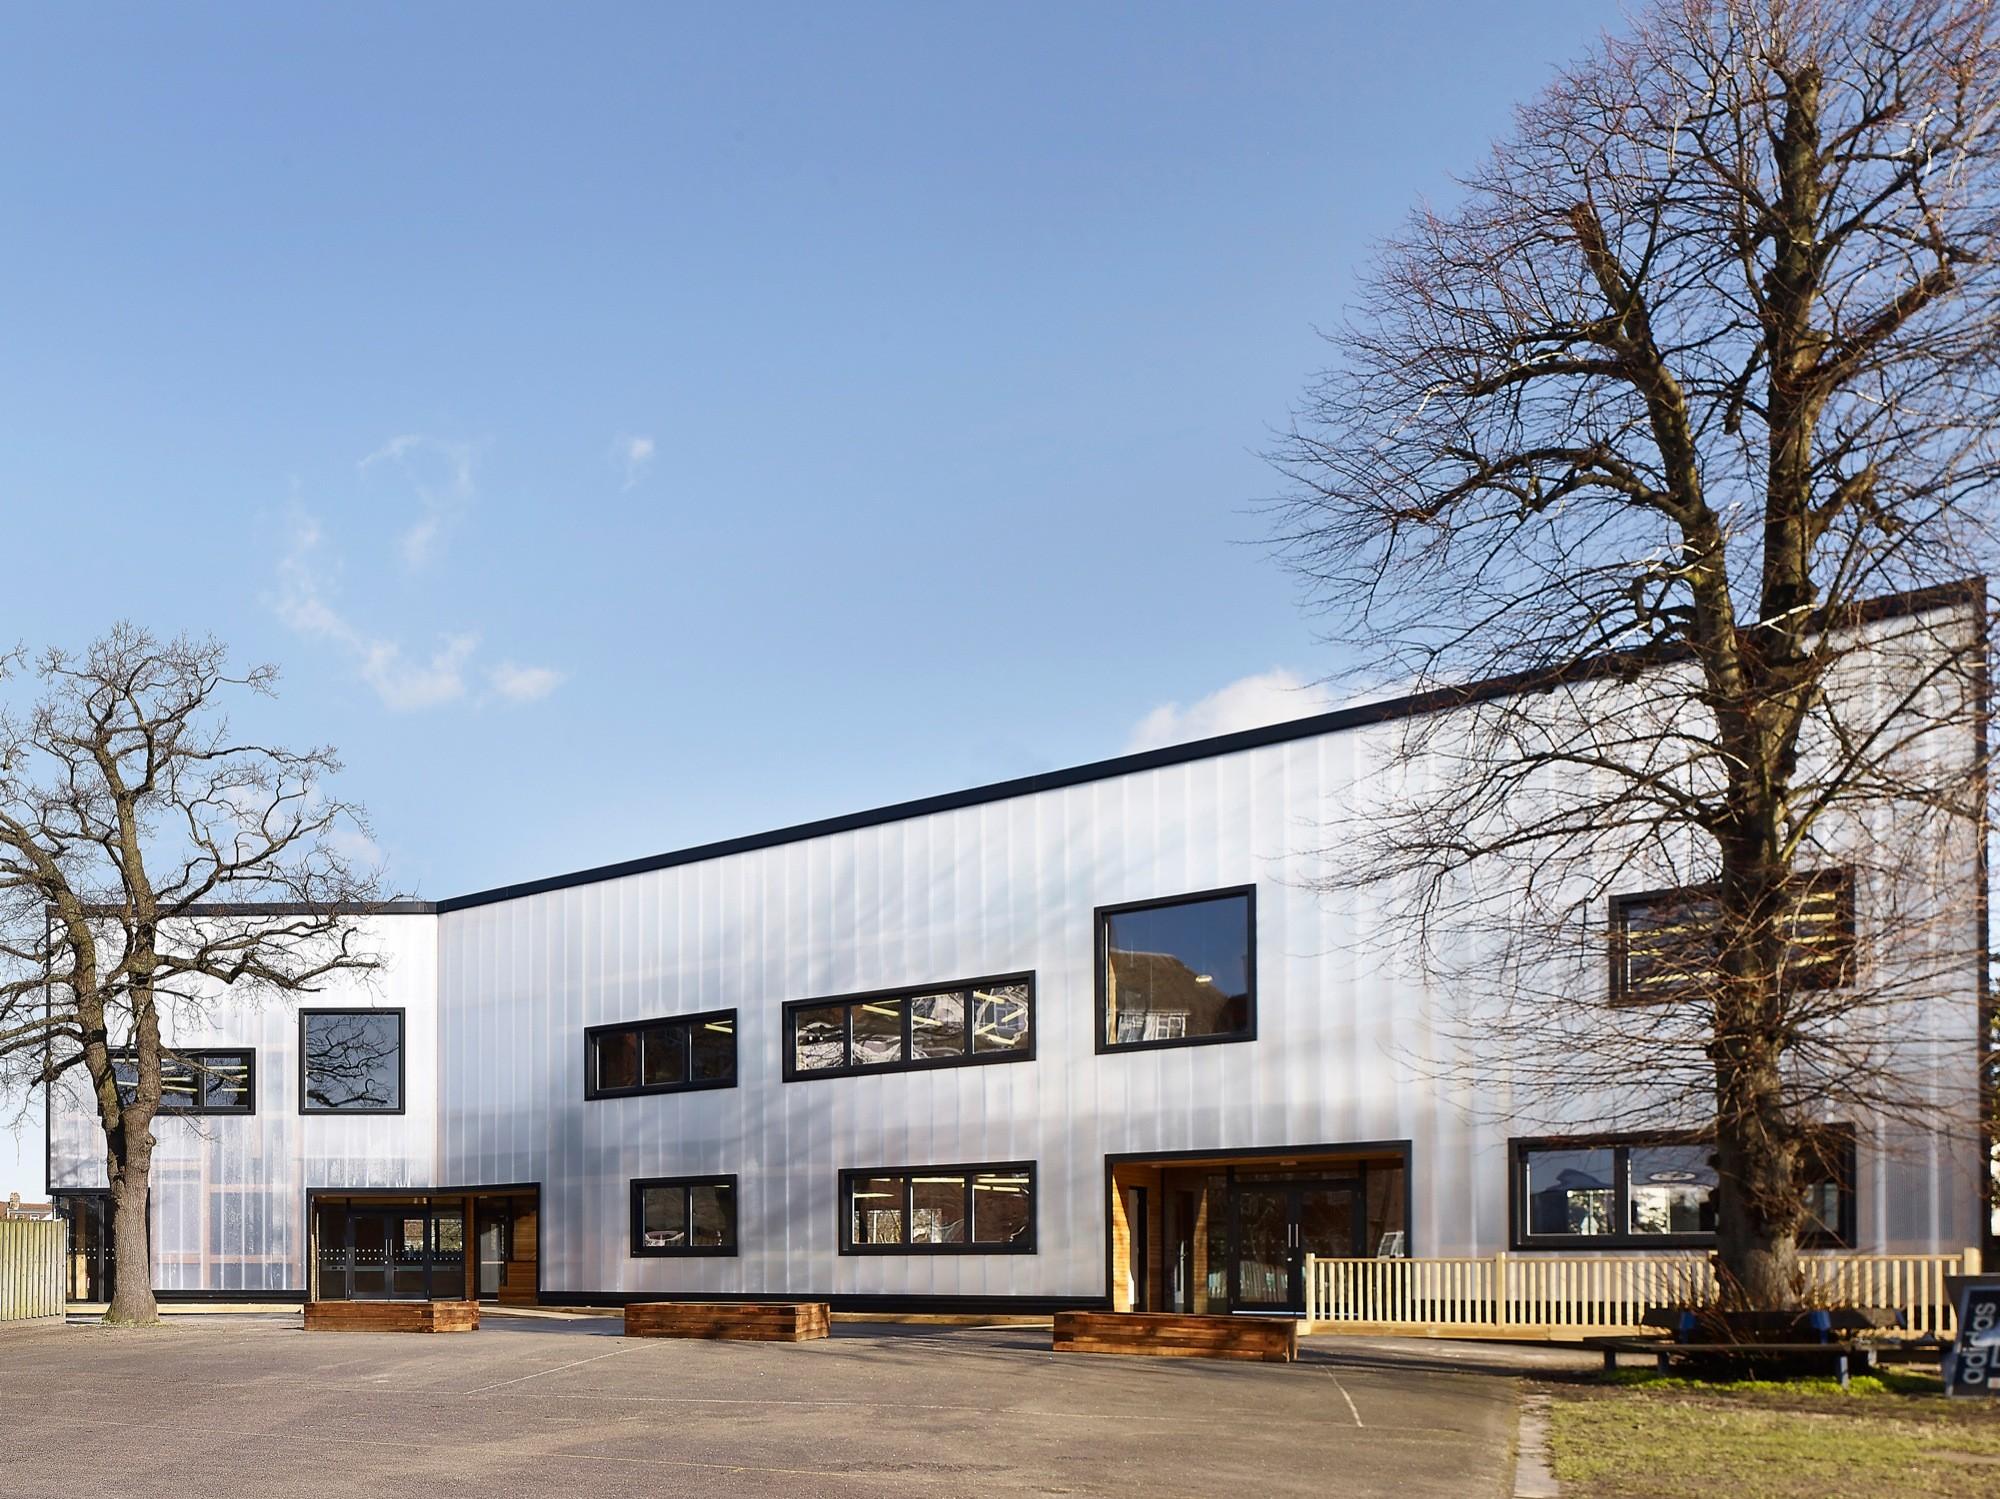 Graveney School Sixth Form Block / Urban Projects Bureau, © Kilian O'Sullivan